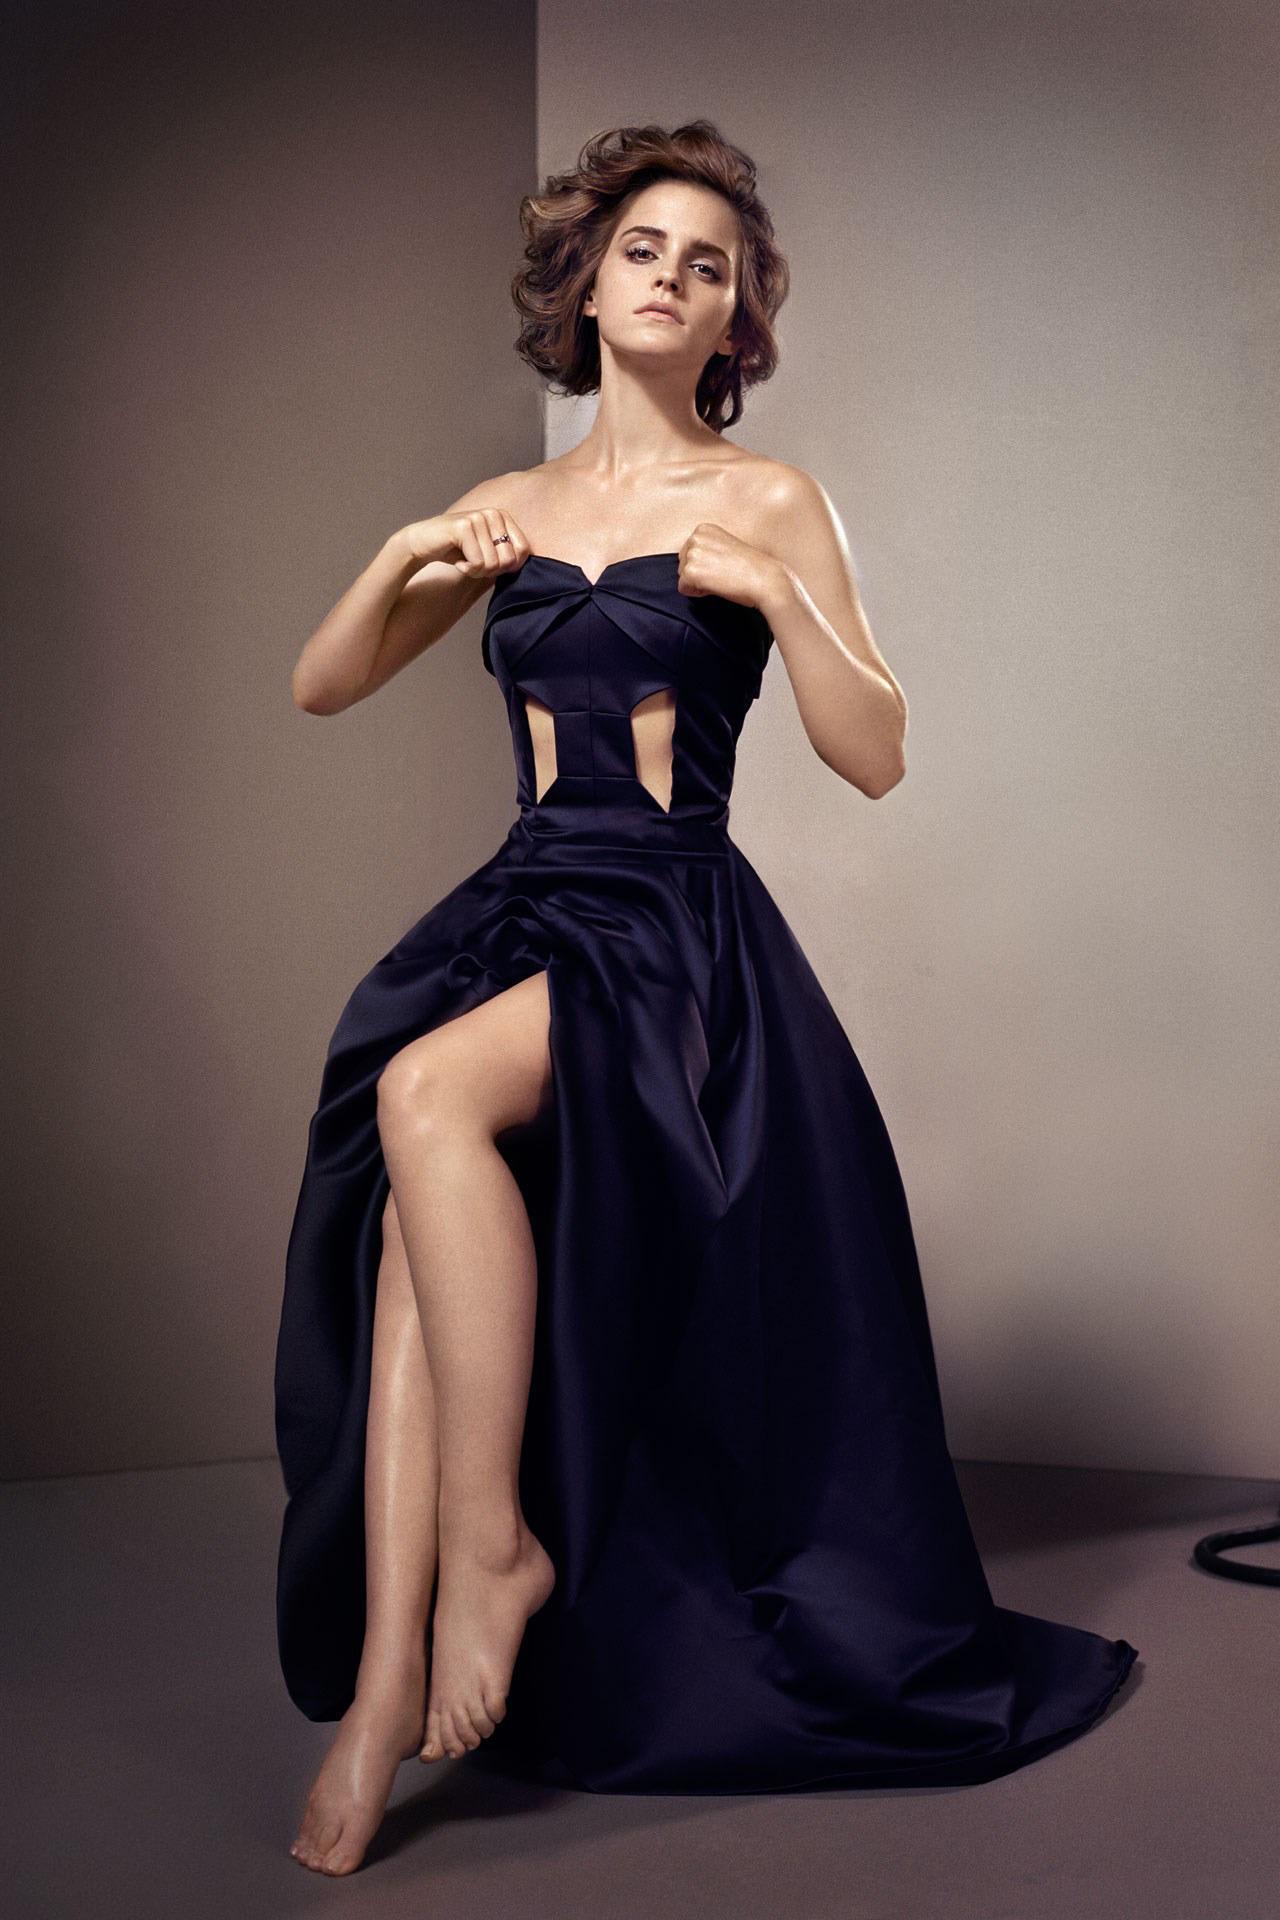 https://pics.wikifeet.com/Emma-Watson-Feet-1257557.jpg